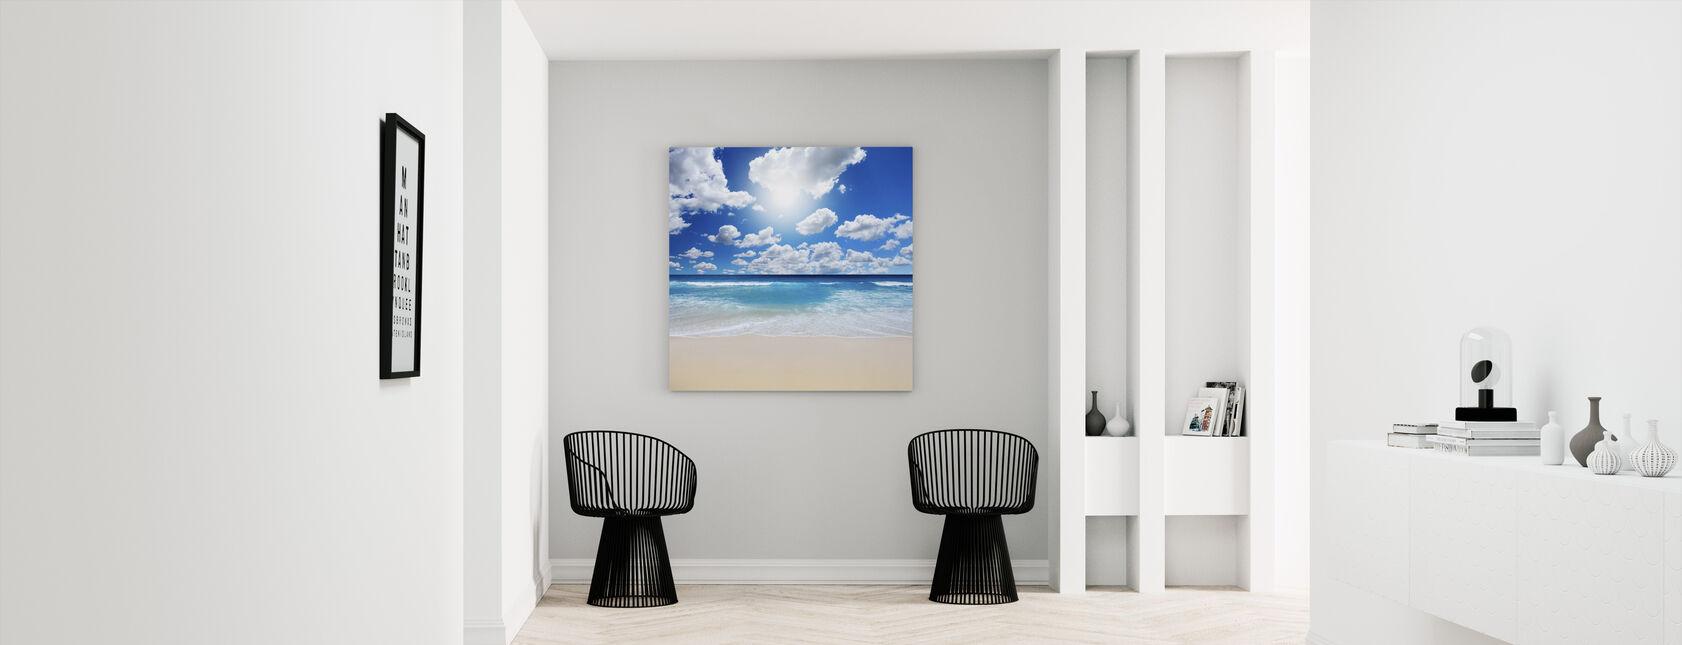 Summertime at the Beach - Canvas print - Hallway